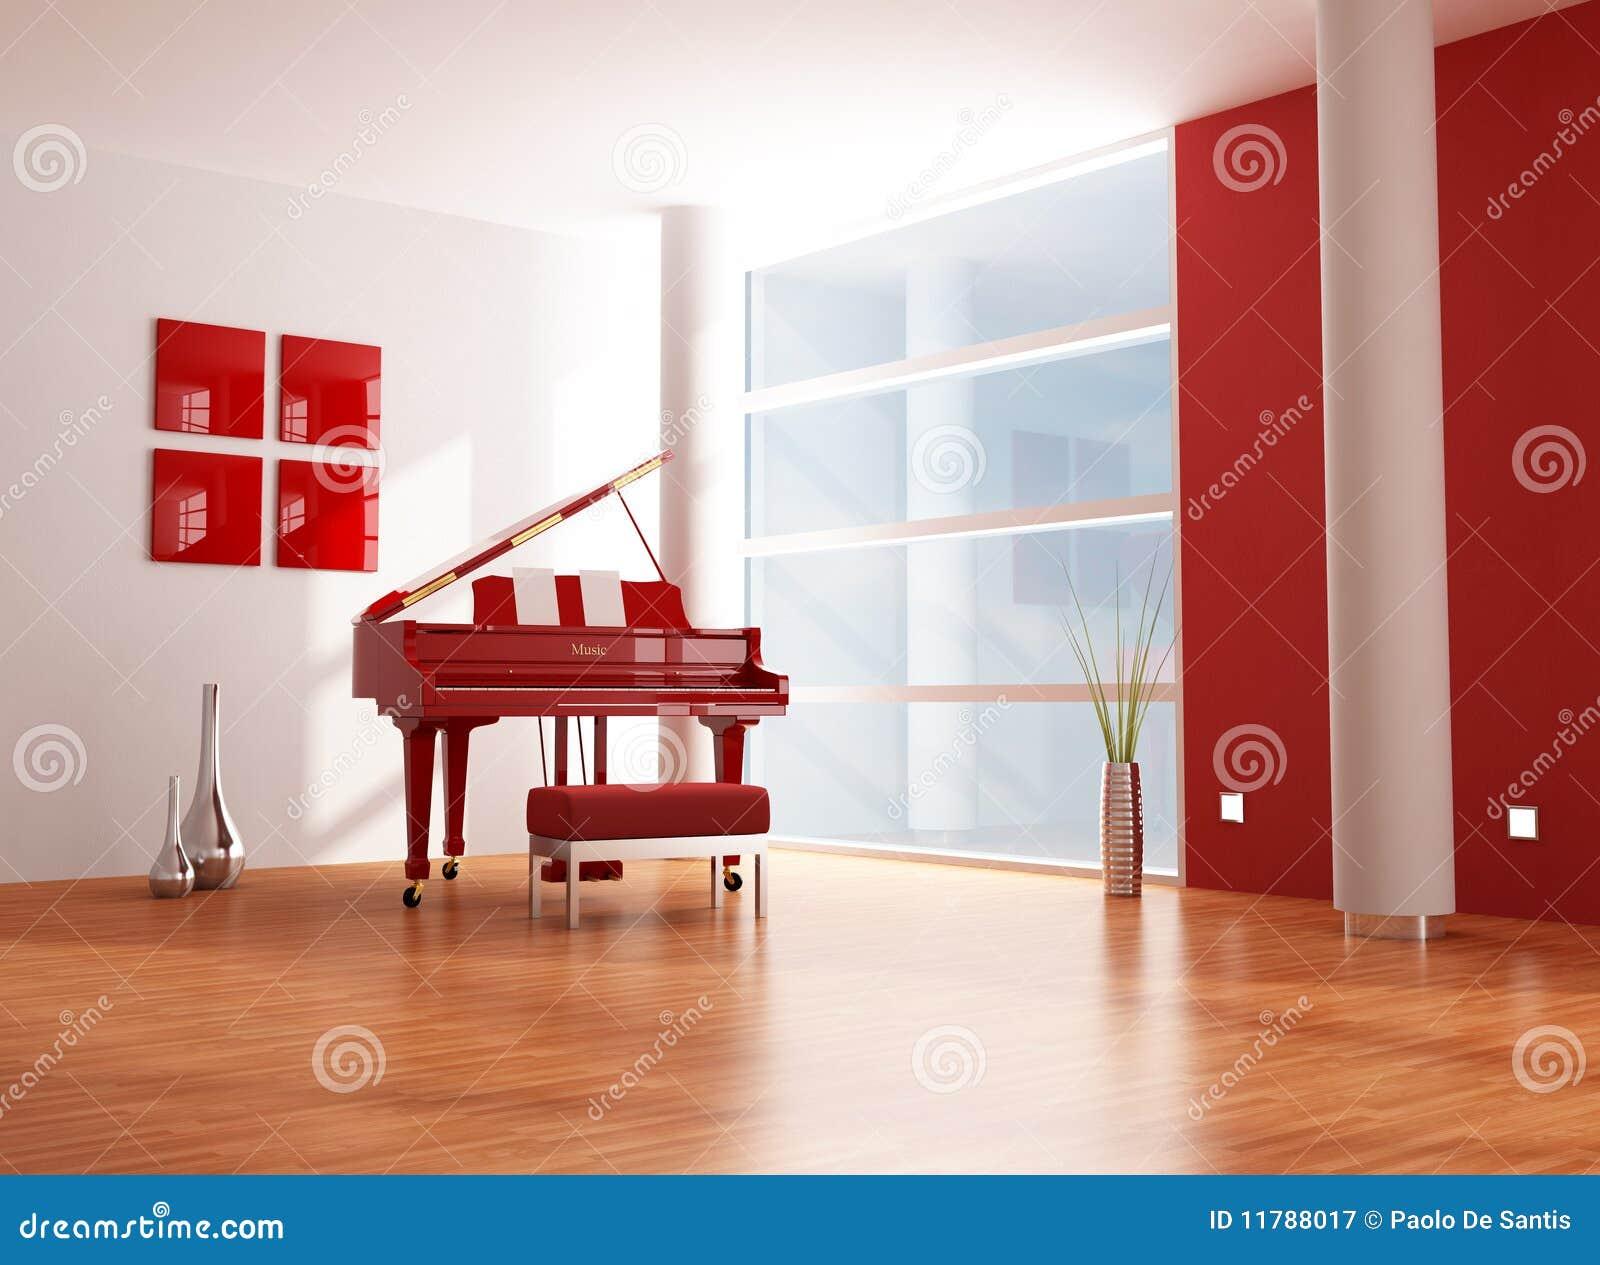 red and white music room stock illustration illustration of vase rh dreamstime com